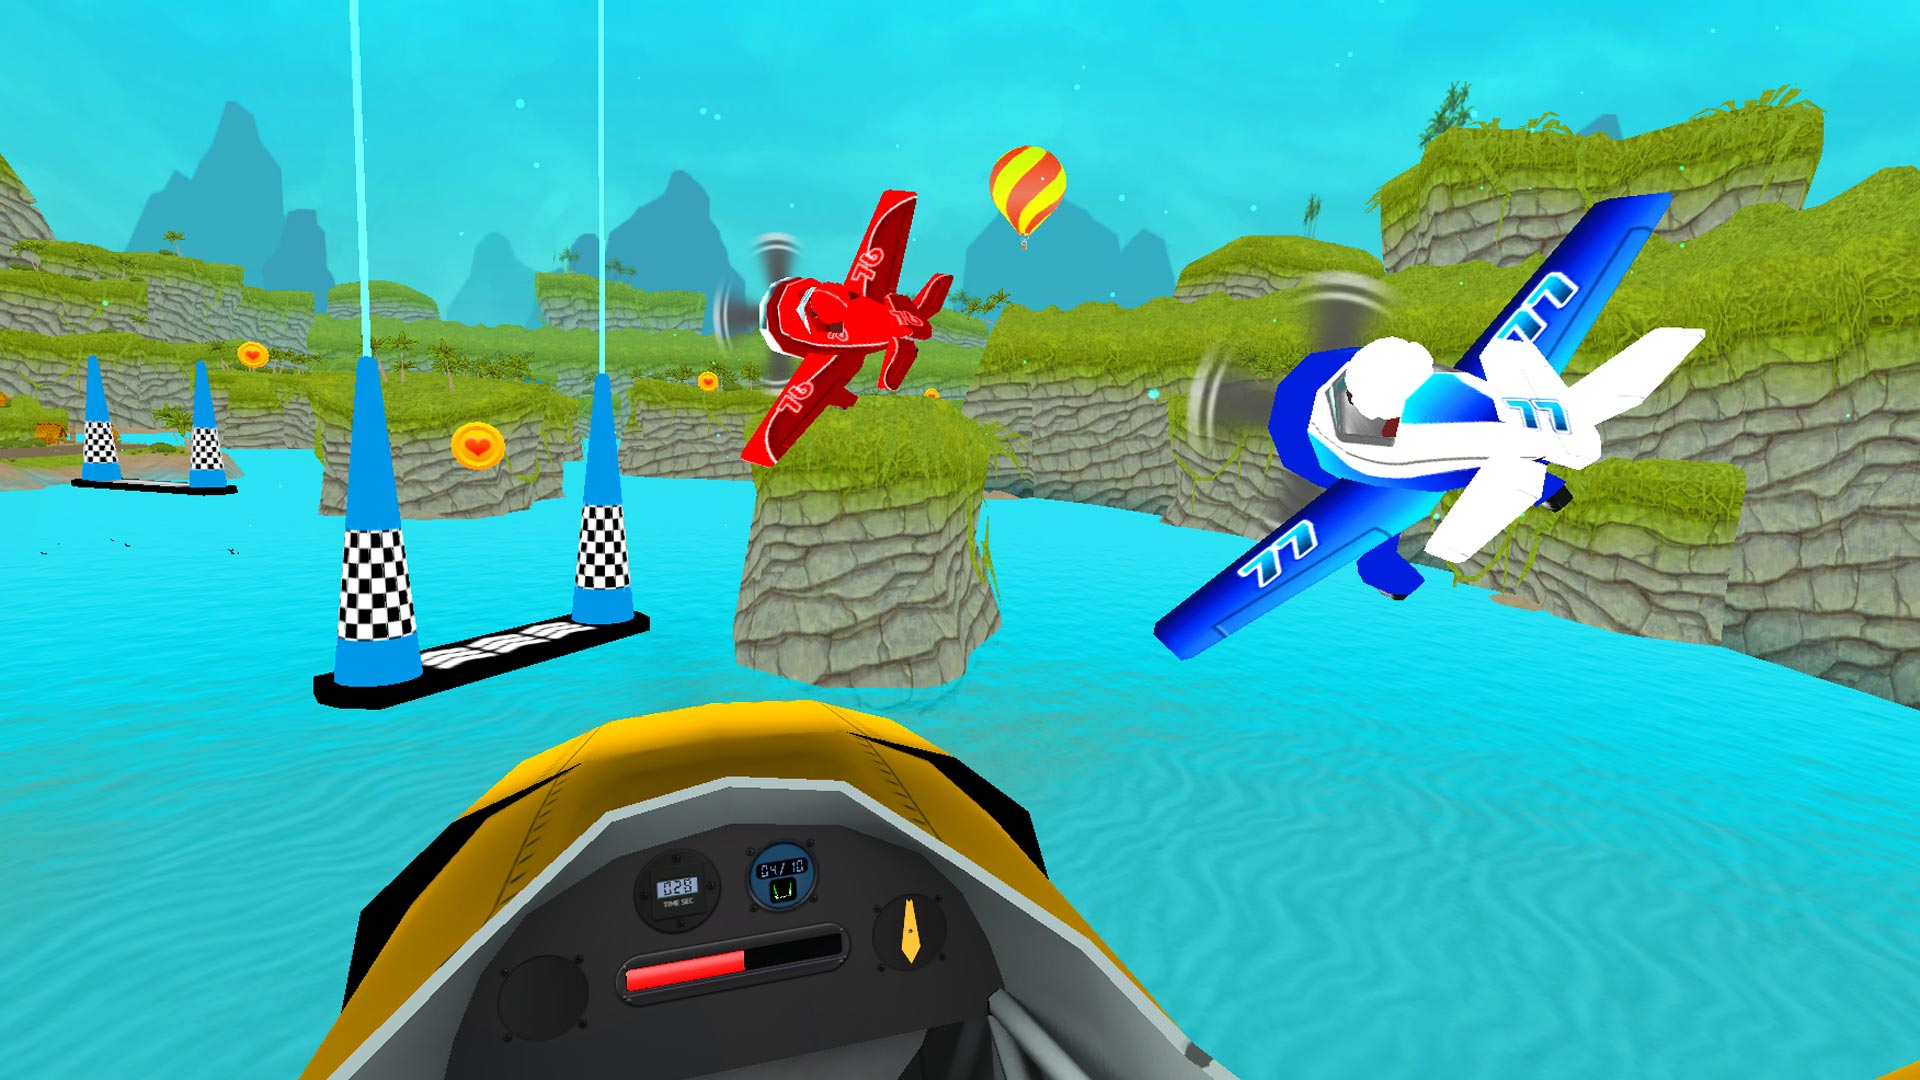 Pirate Flight VR